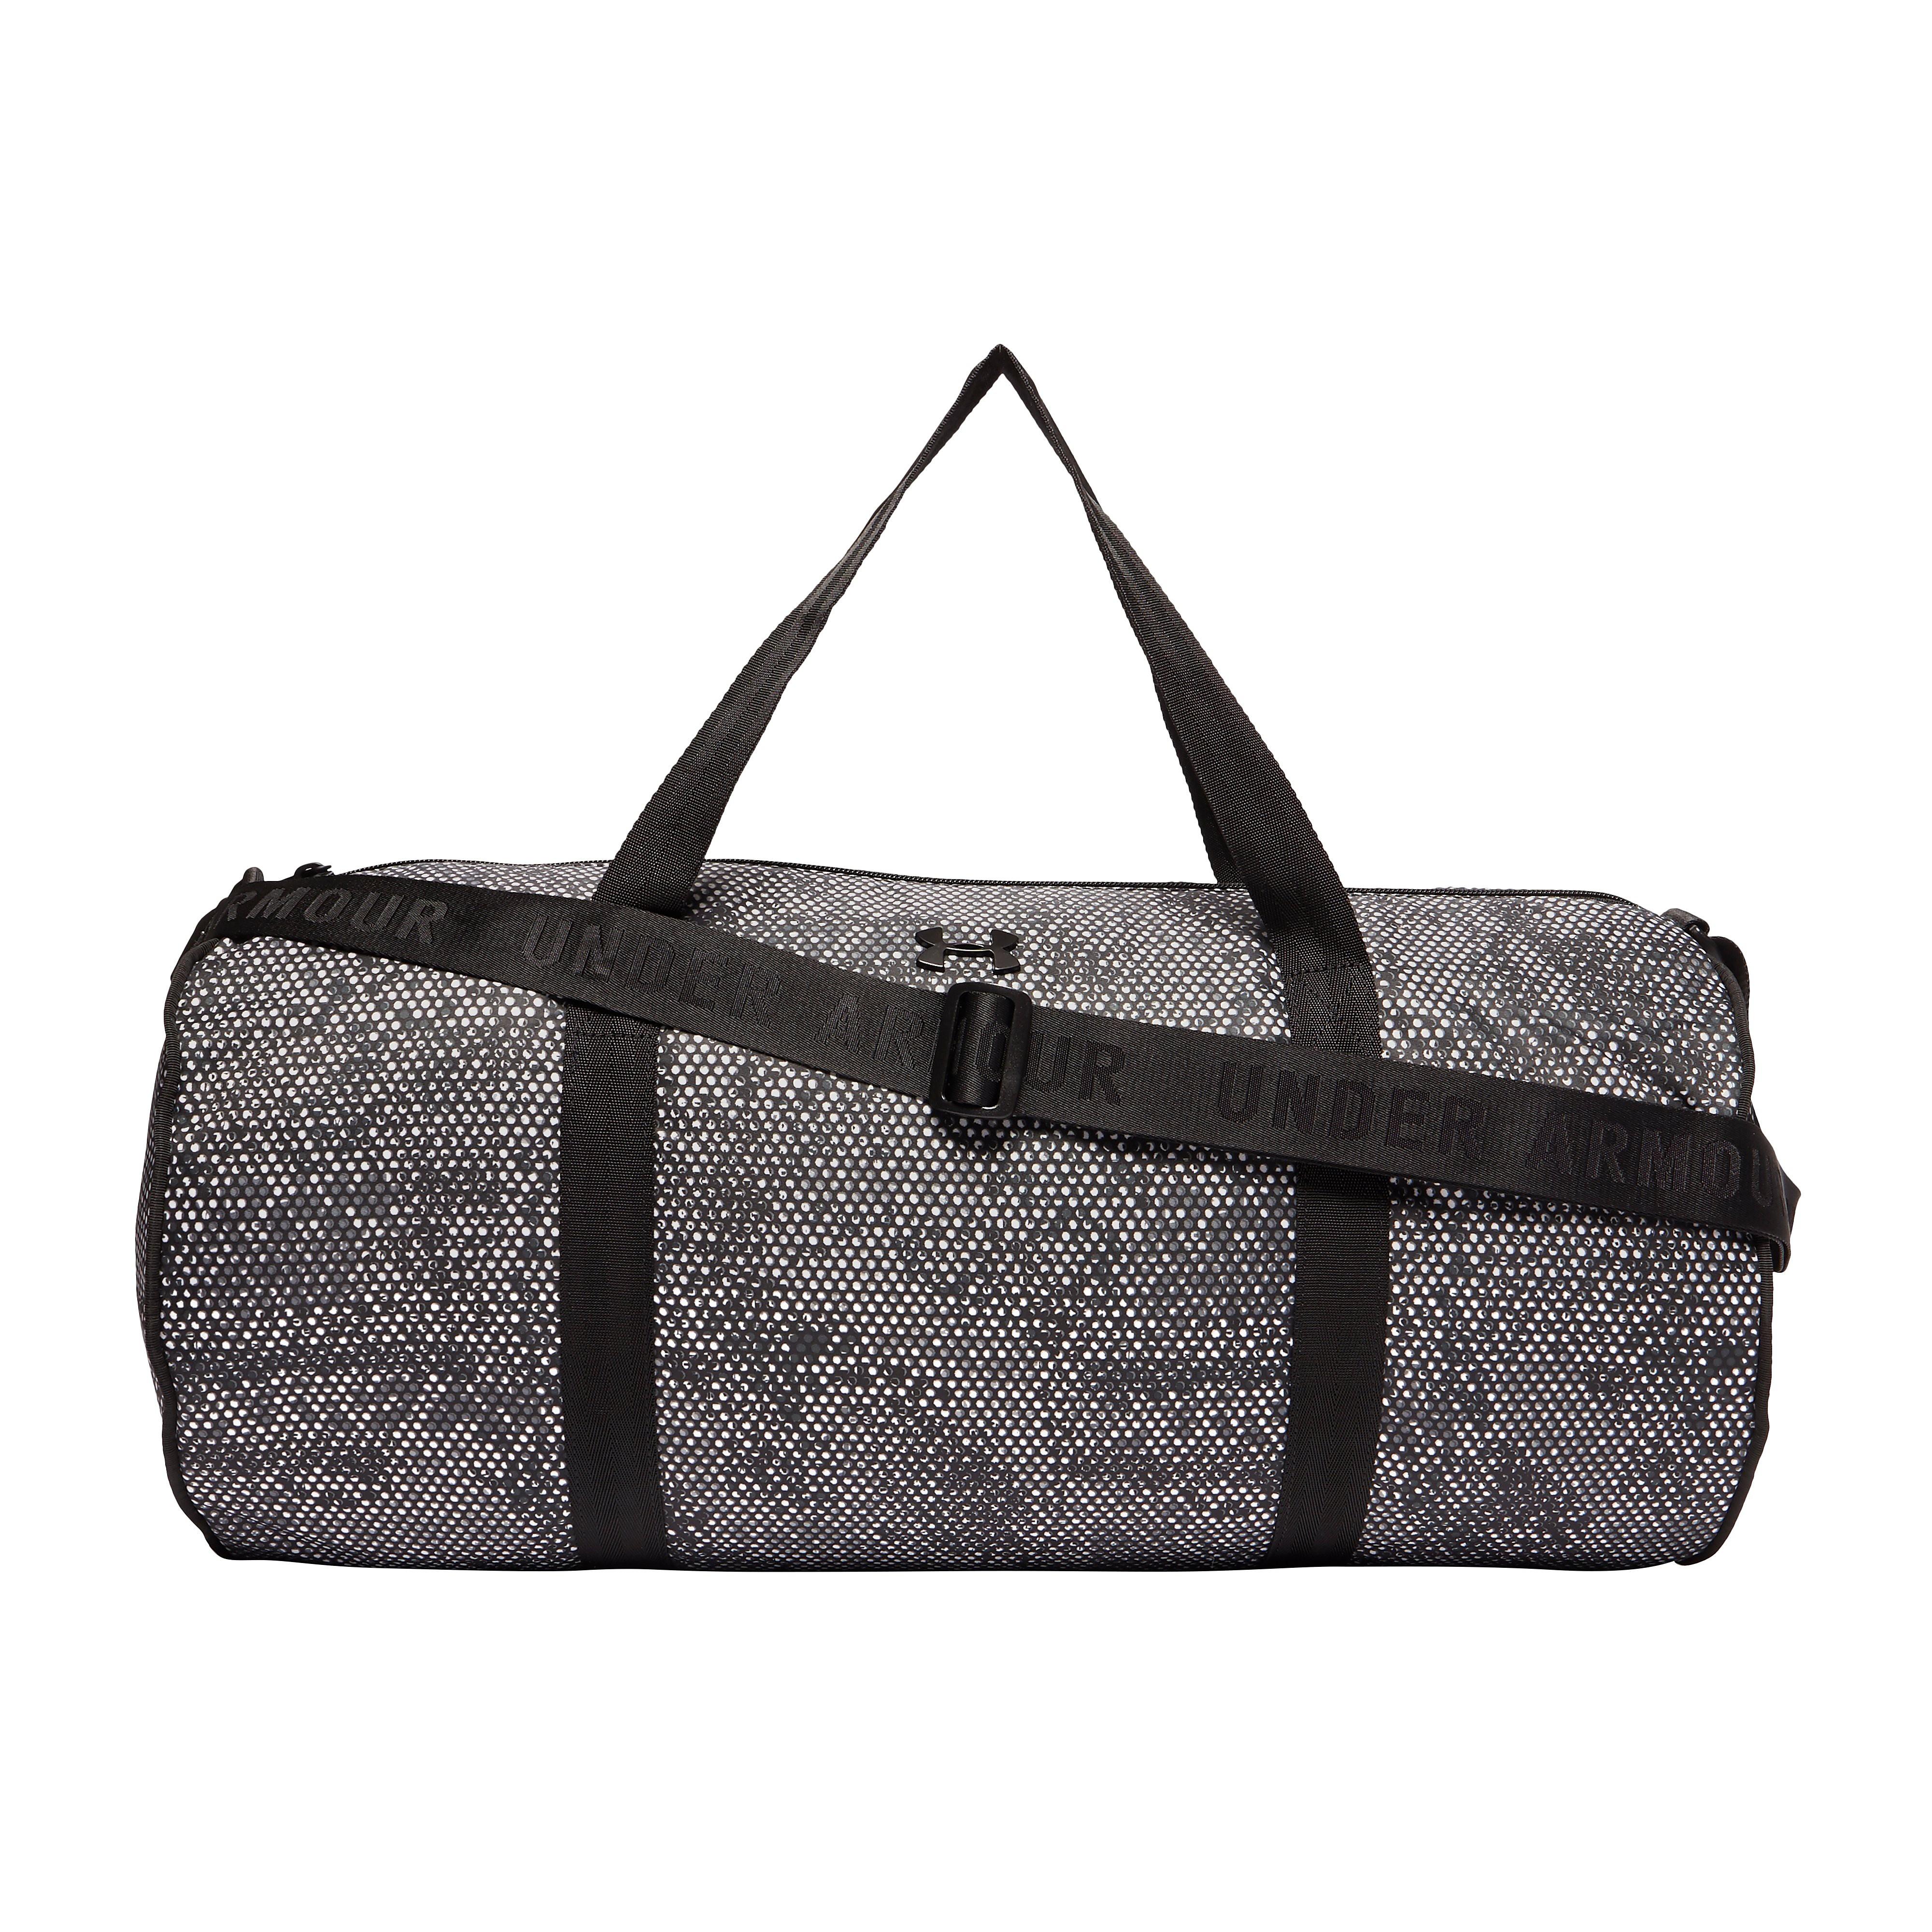 Under Armour Favorite Duffel Bag 2.0